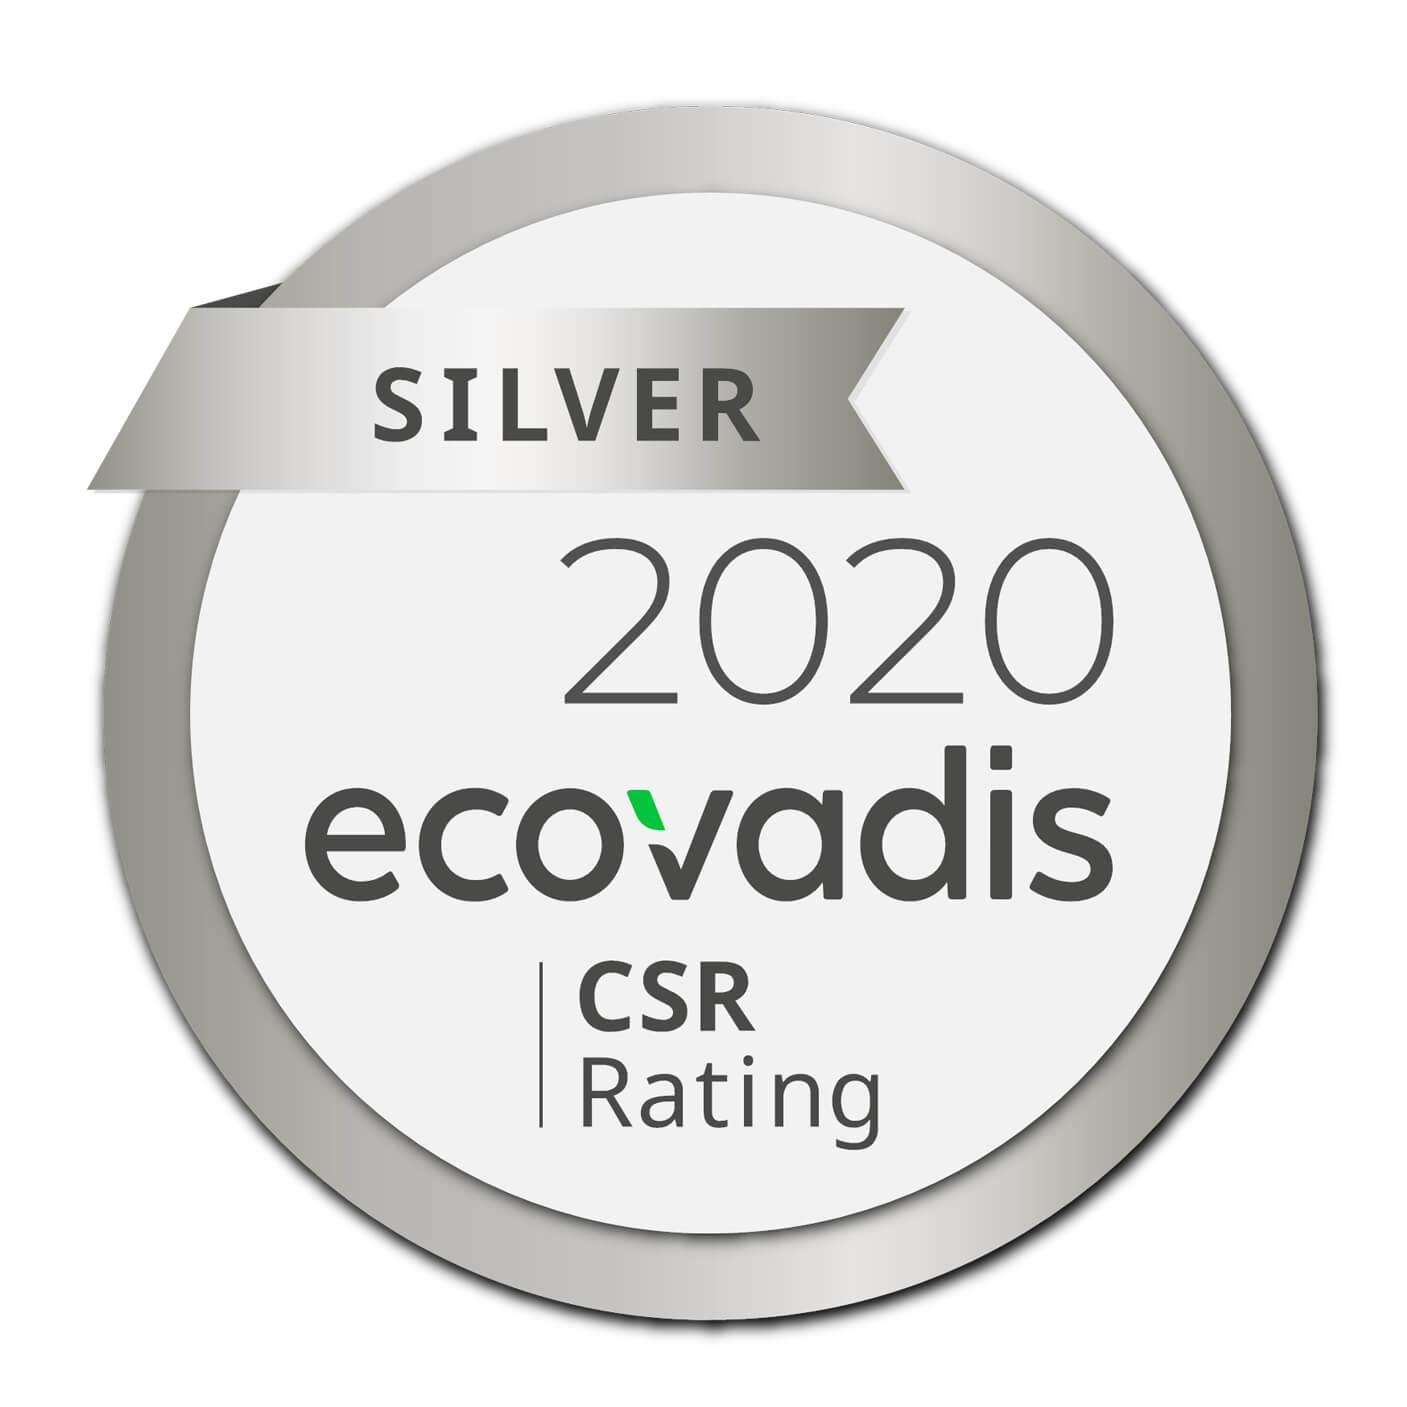 2020 ecovadis